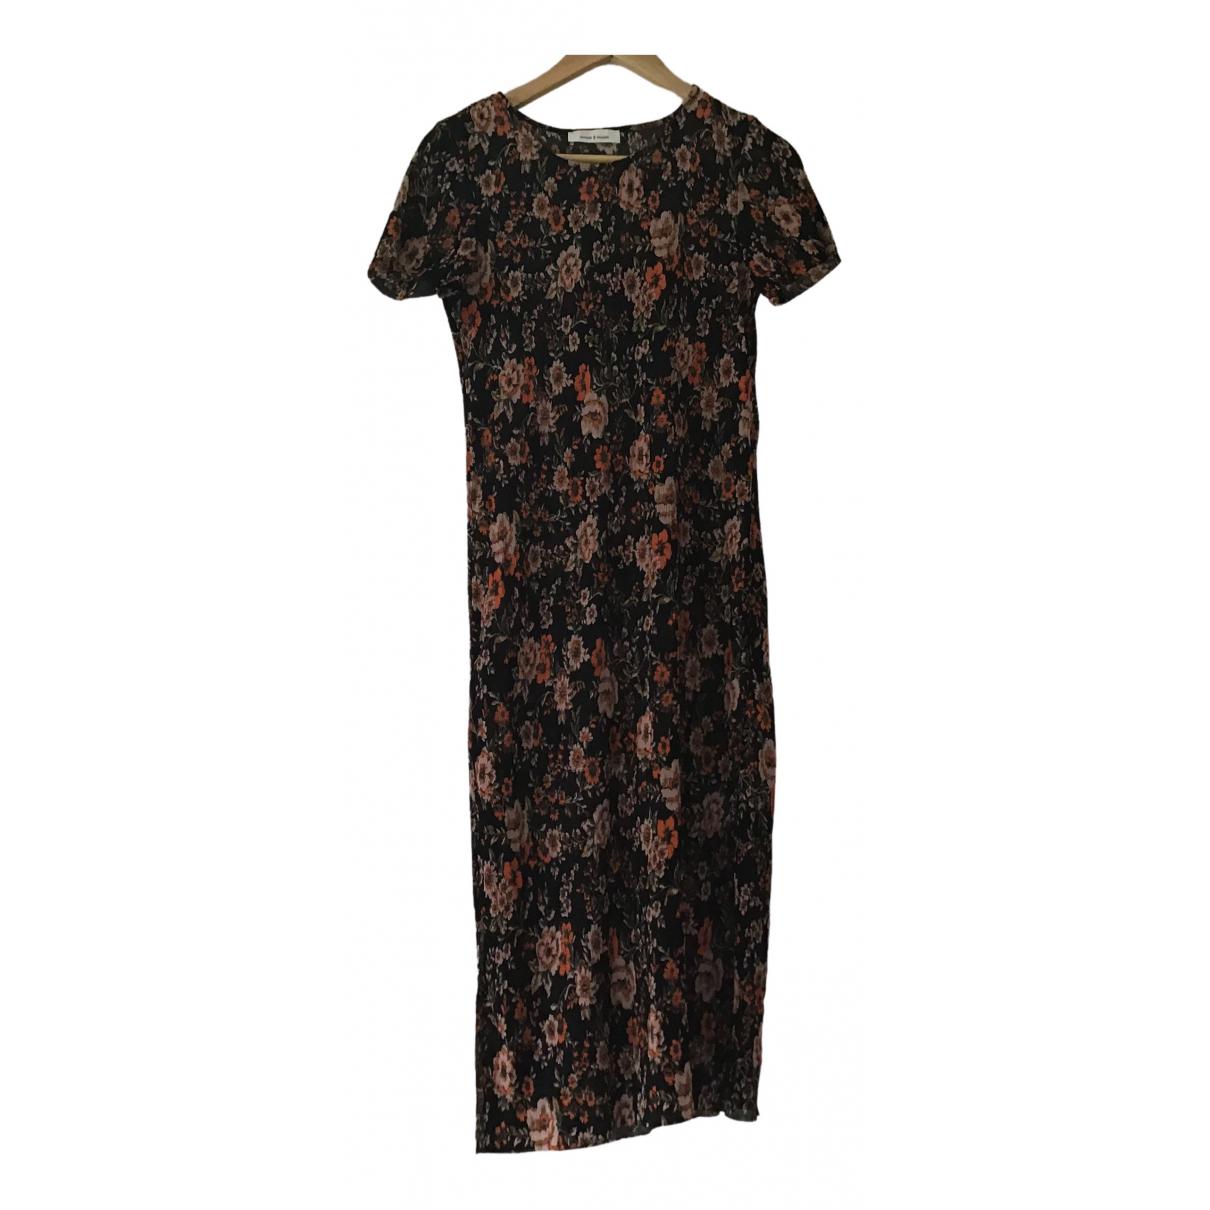 Samsoe & Samsoe \N Brown dress for Women S International